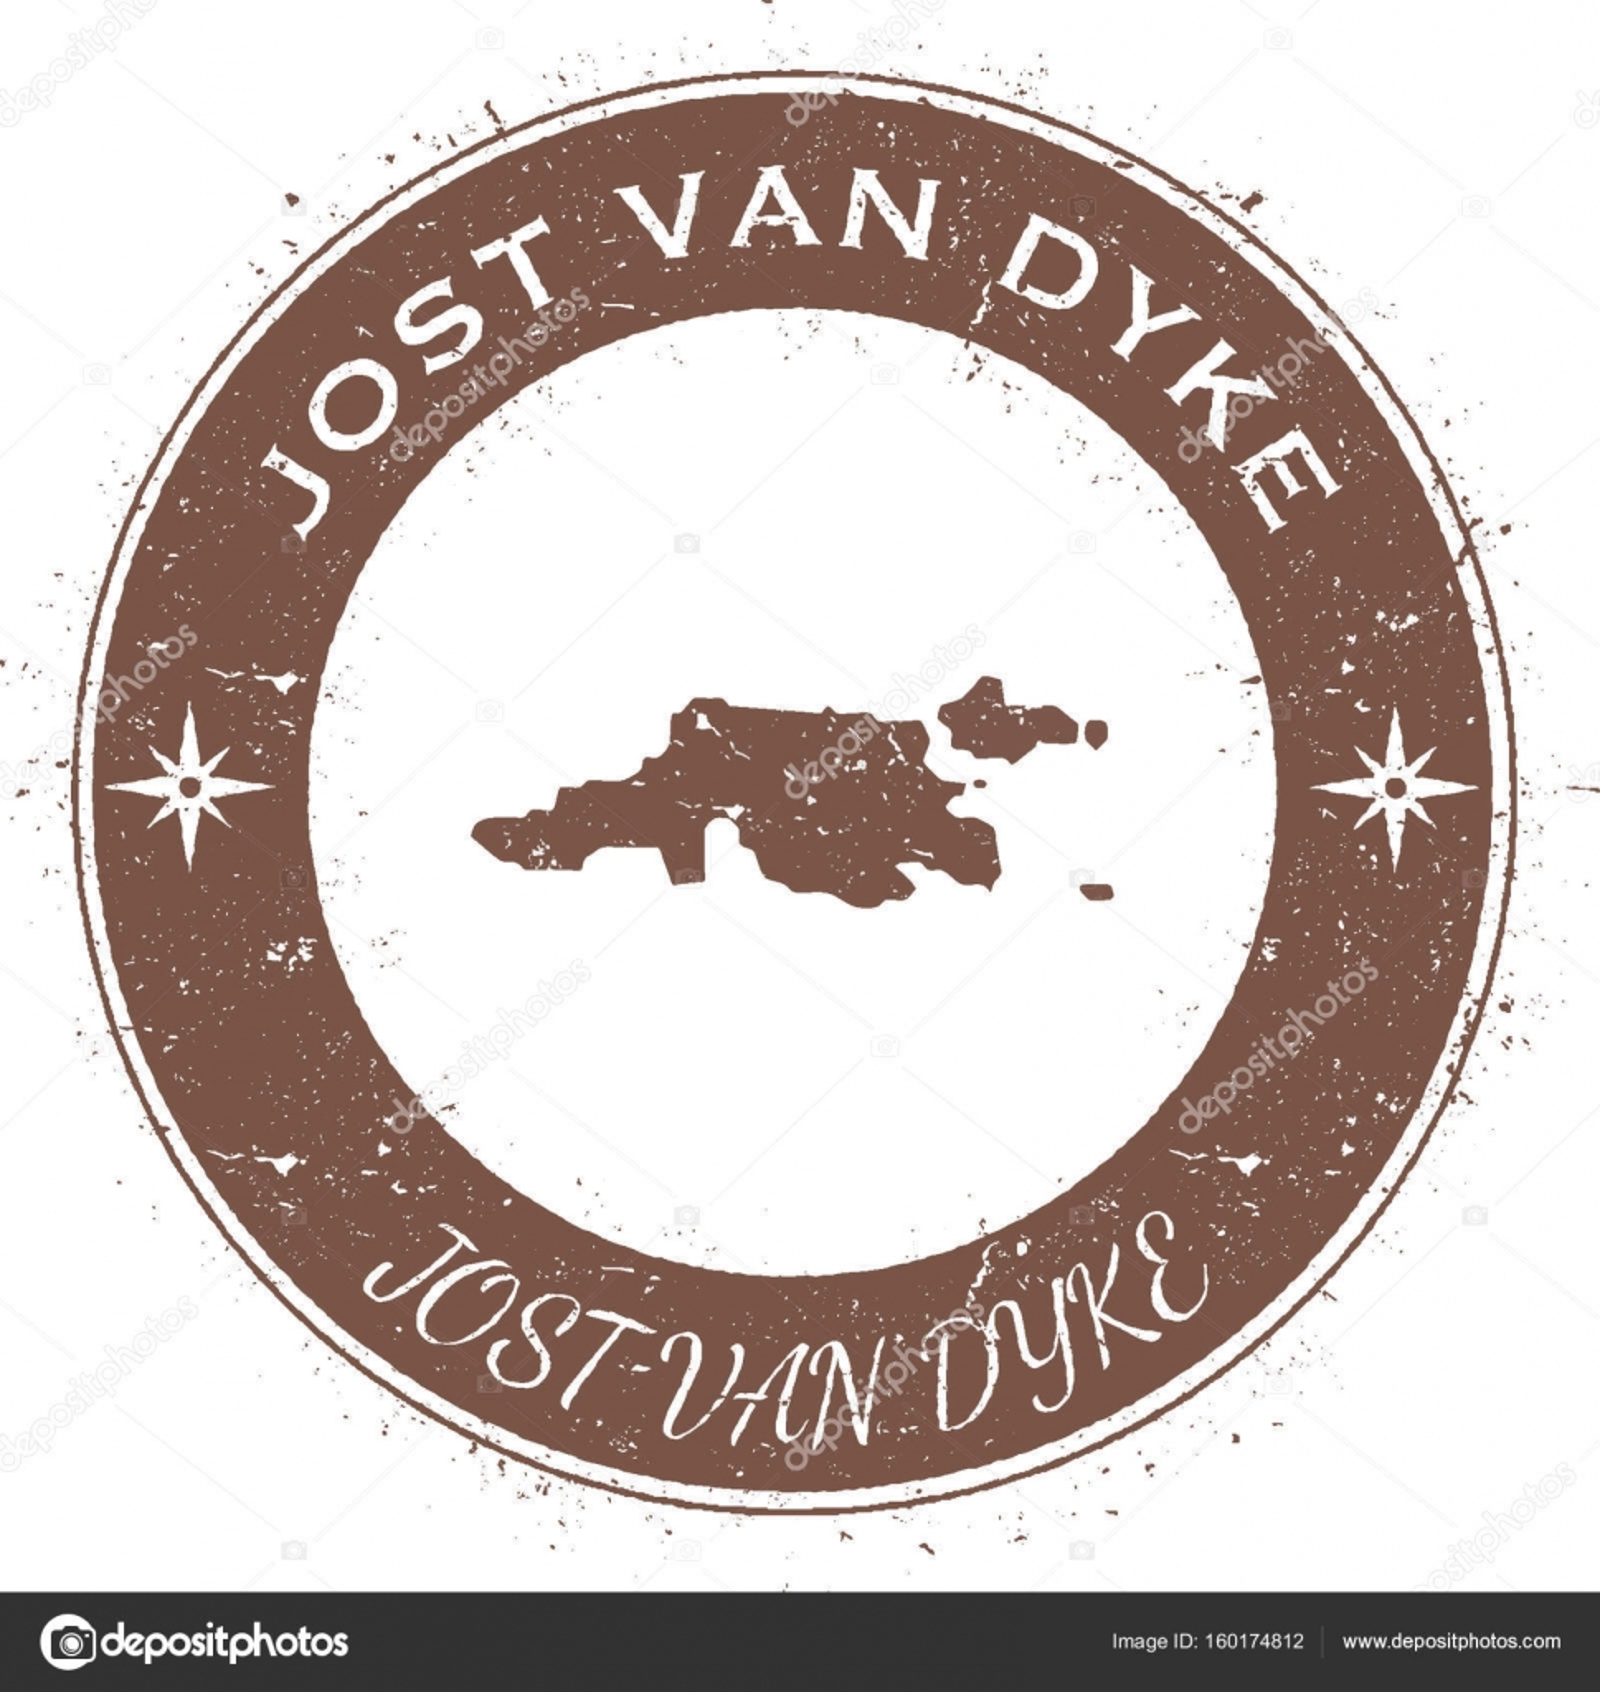 Jost Van Dyke circular patriotic badge Grunge rubber stamp with